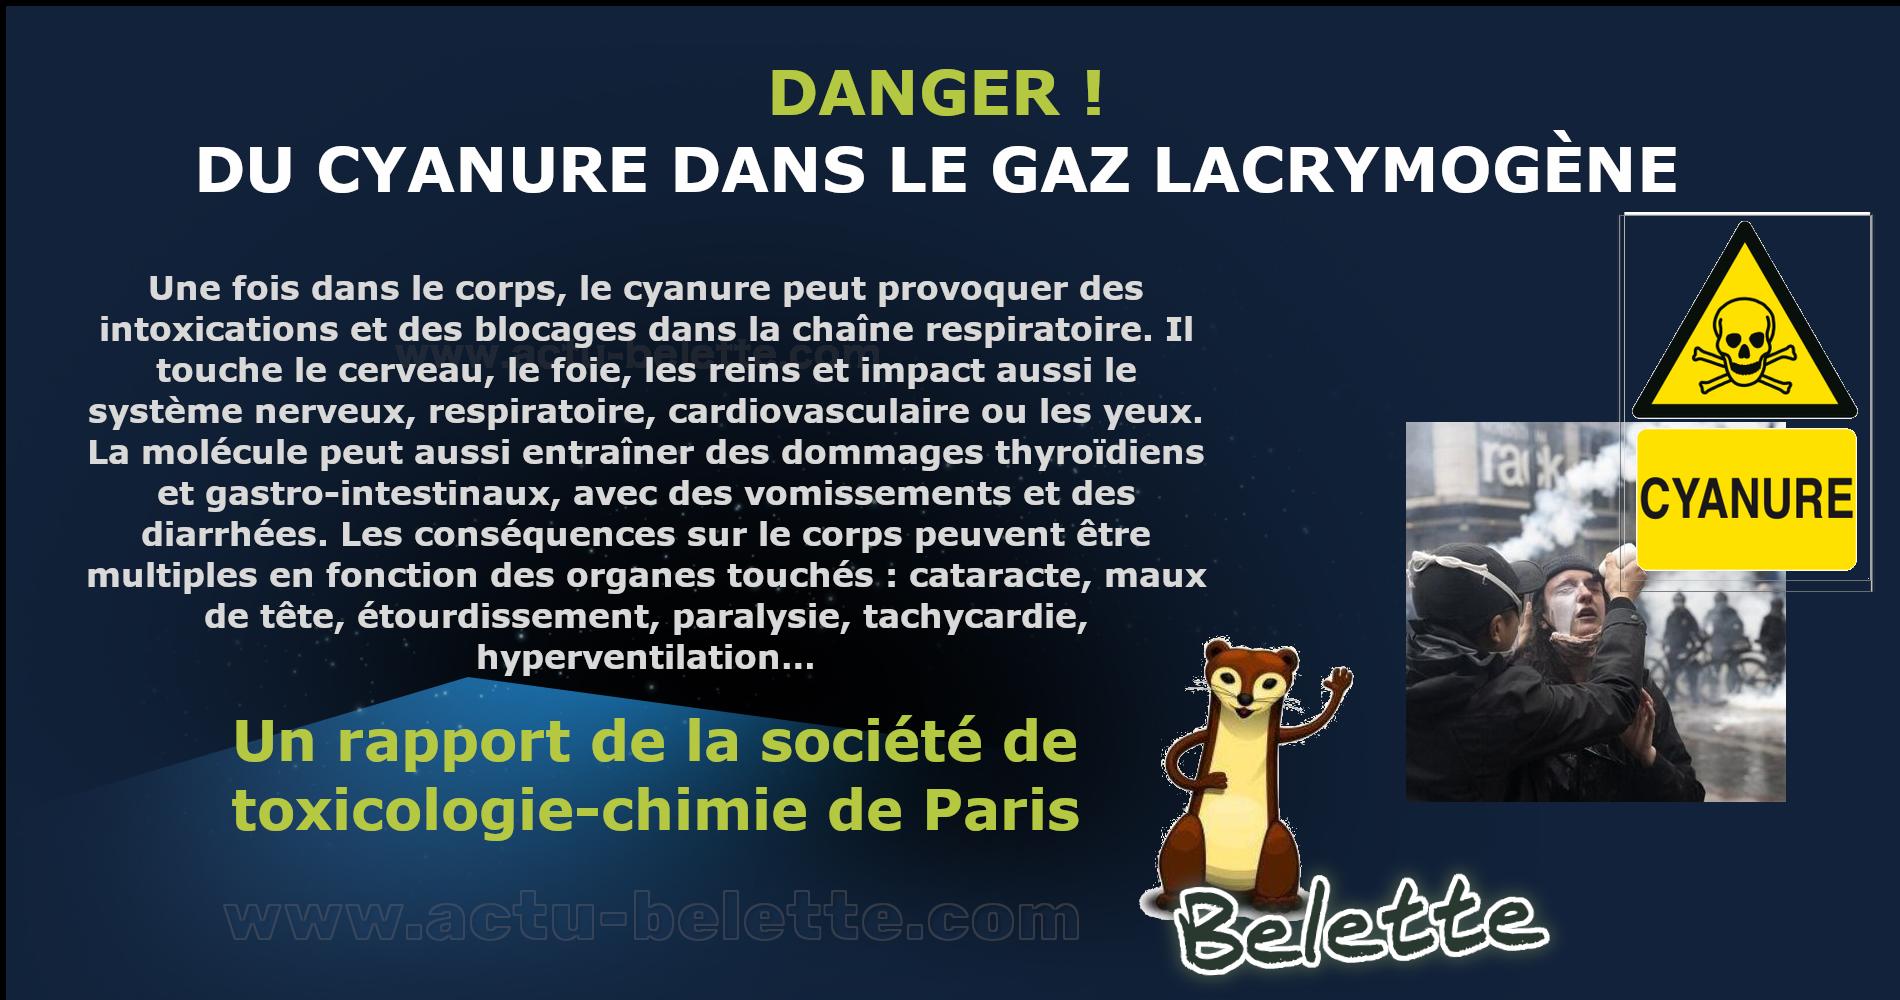 Gaz lacrymogene danger cyanure